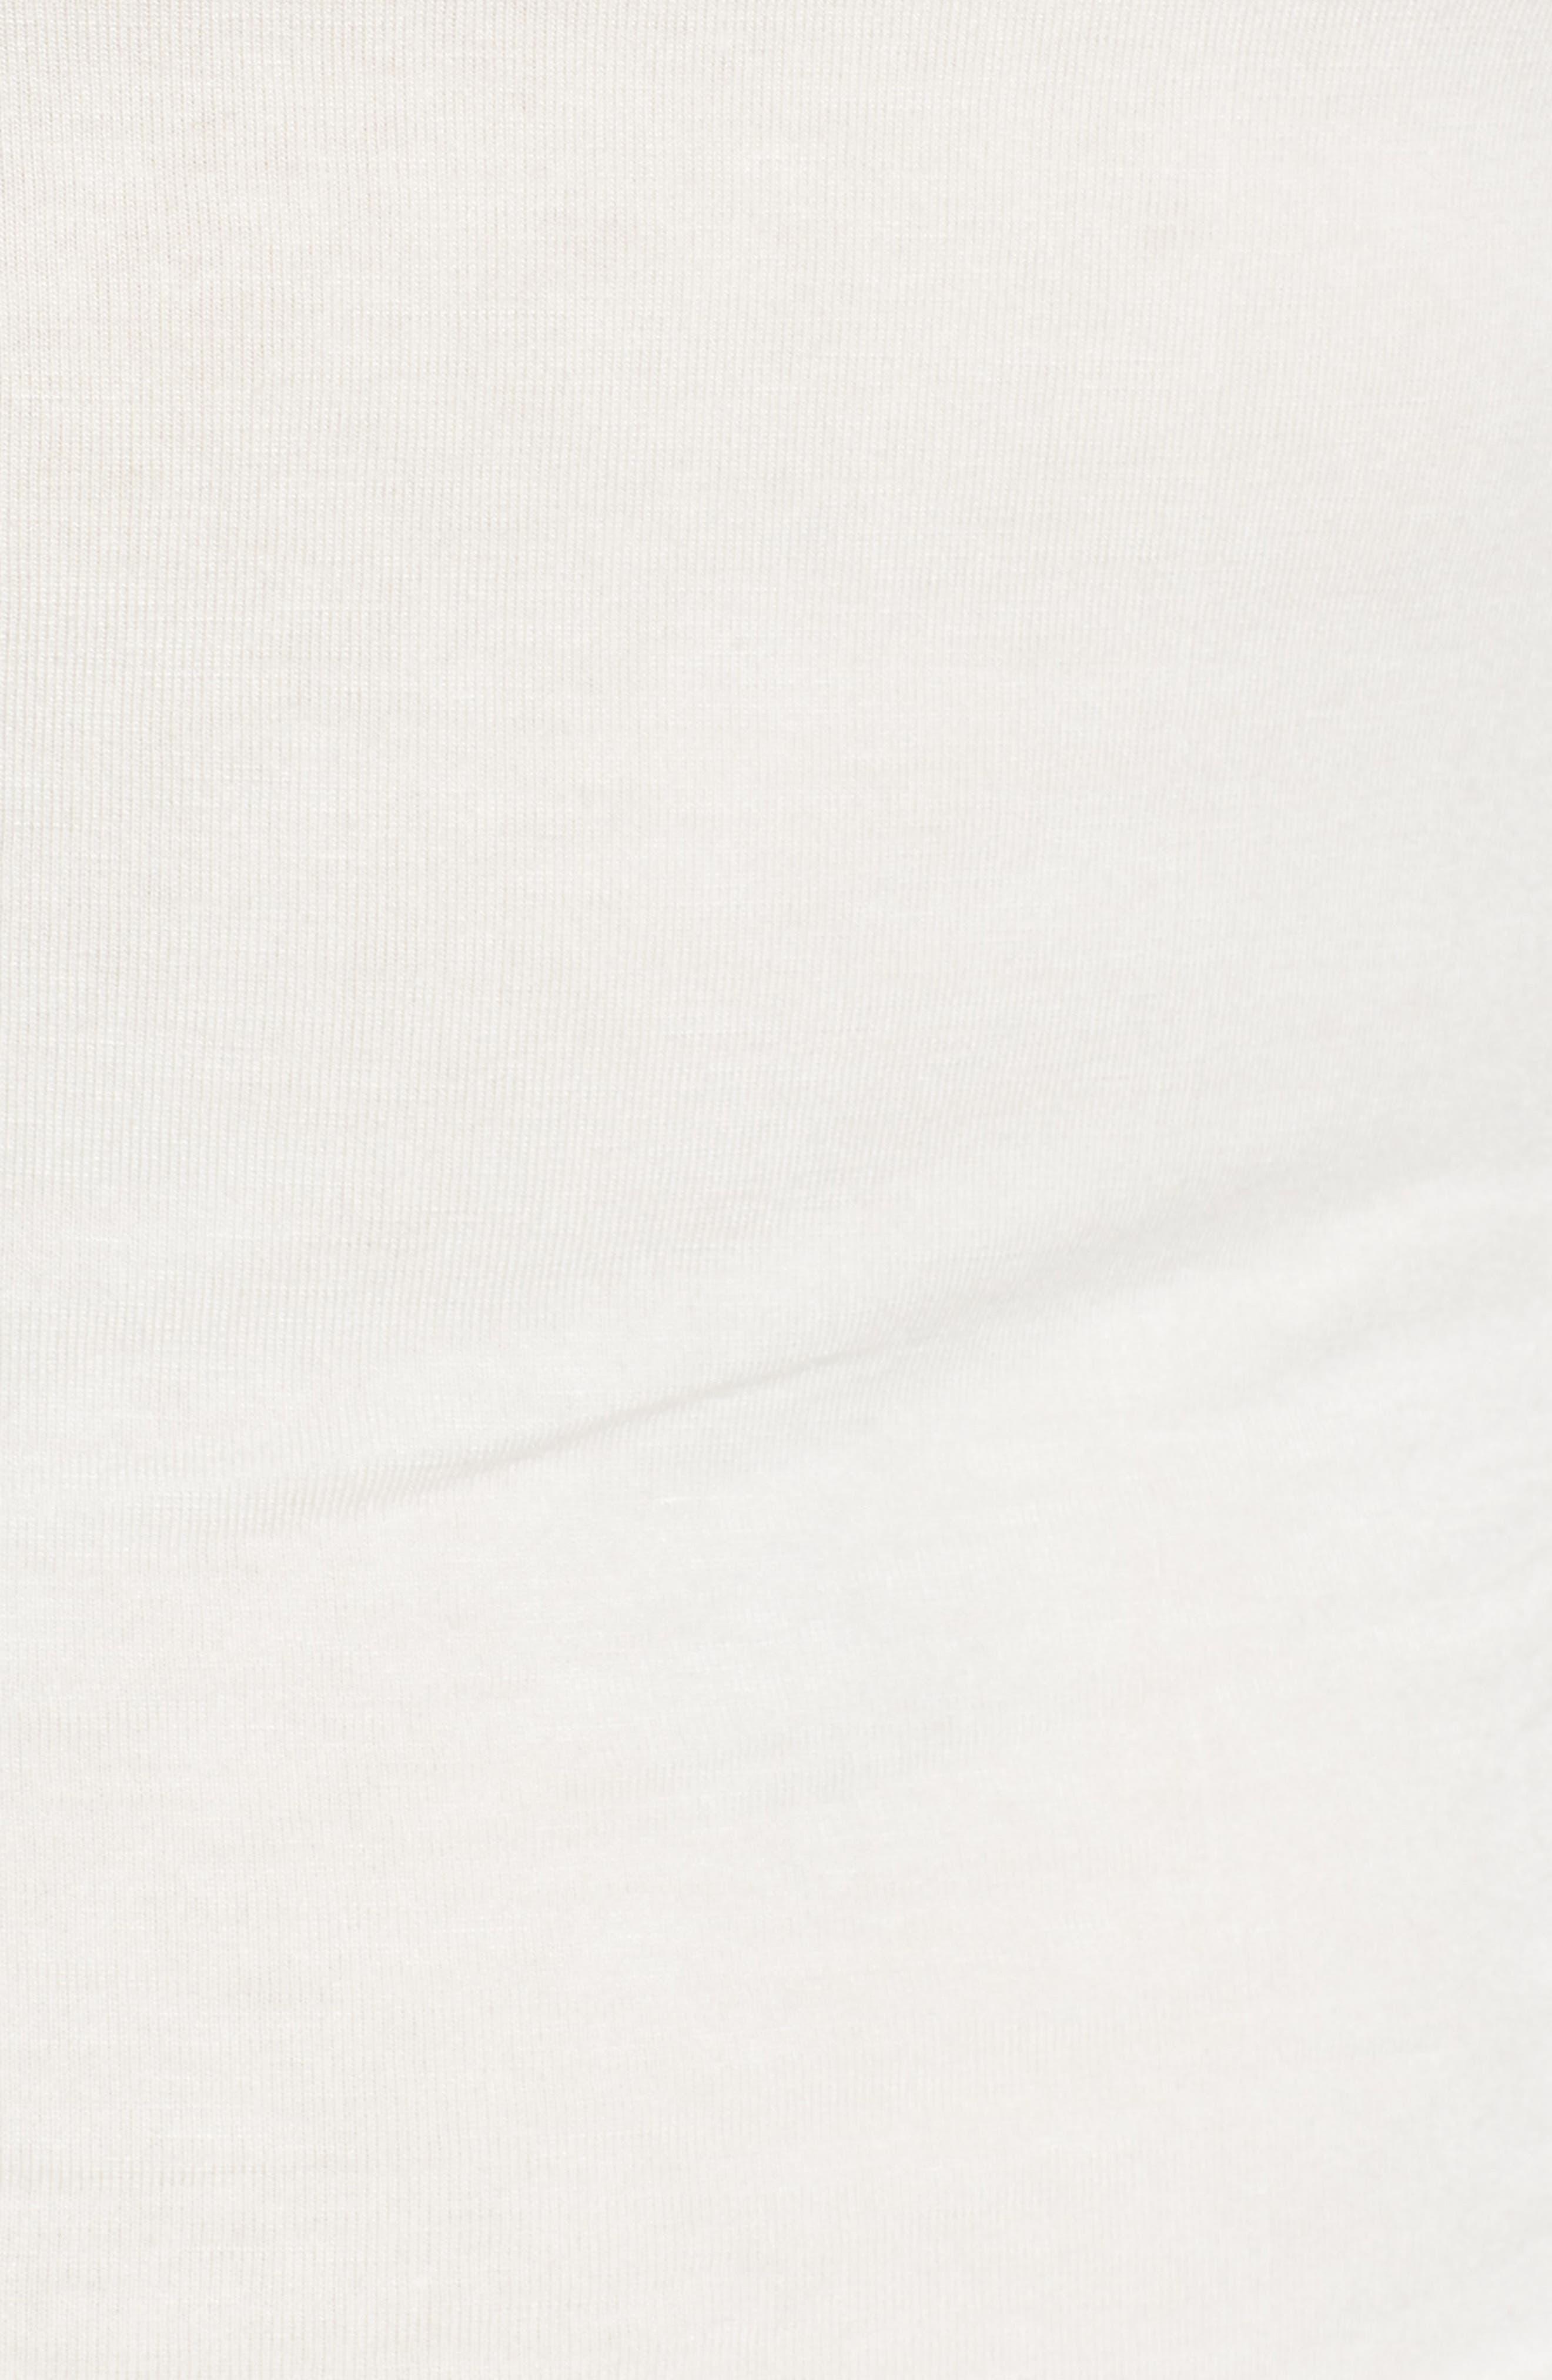 Long Sleeve Turtleneck,                             Alternate thumbnail 5, color,                             Ivory Cloud